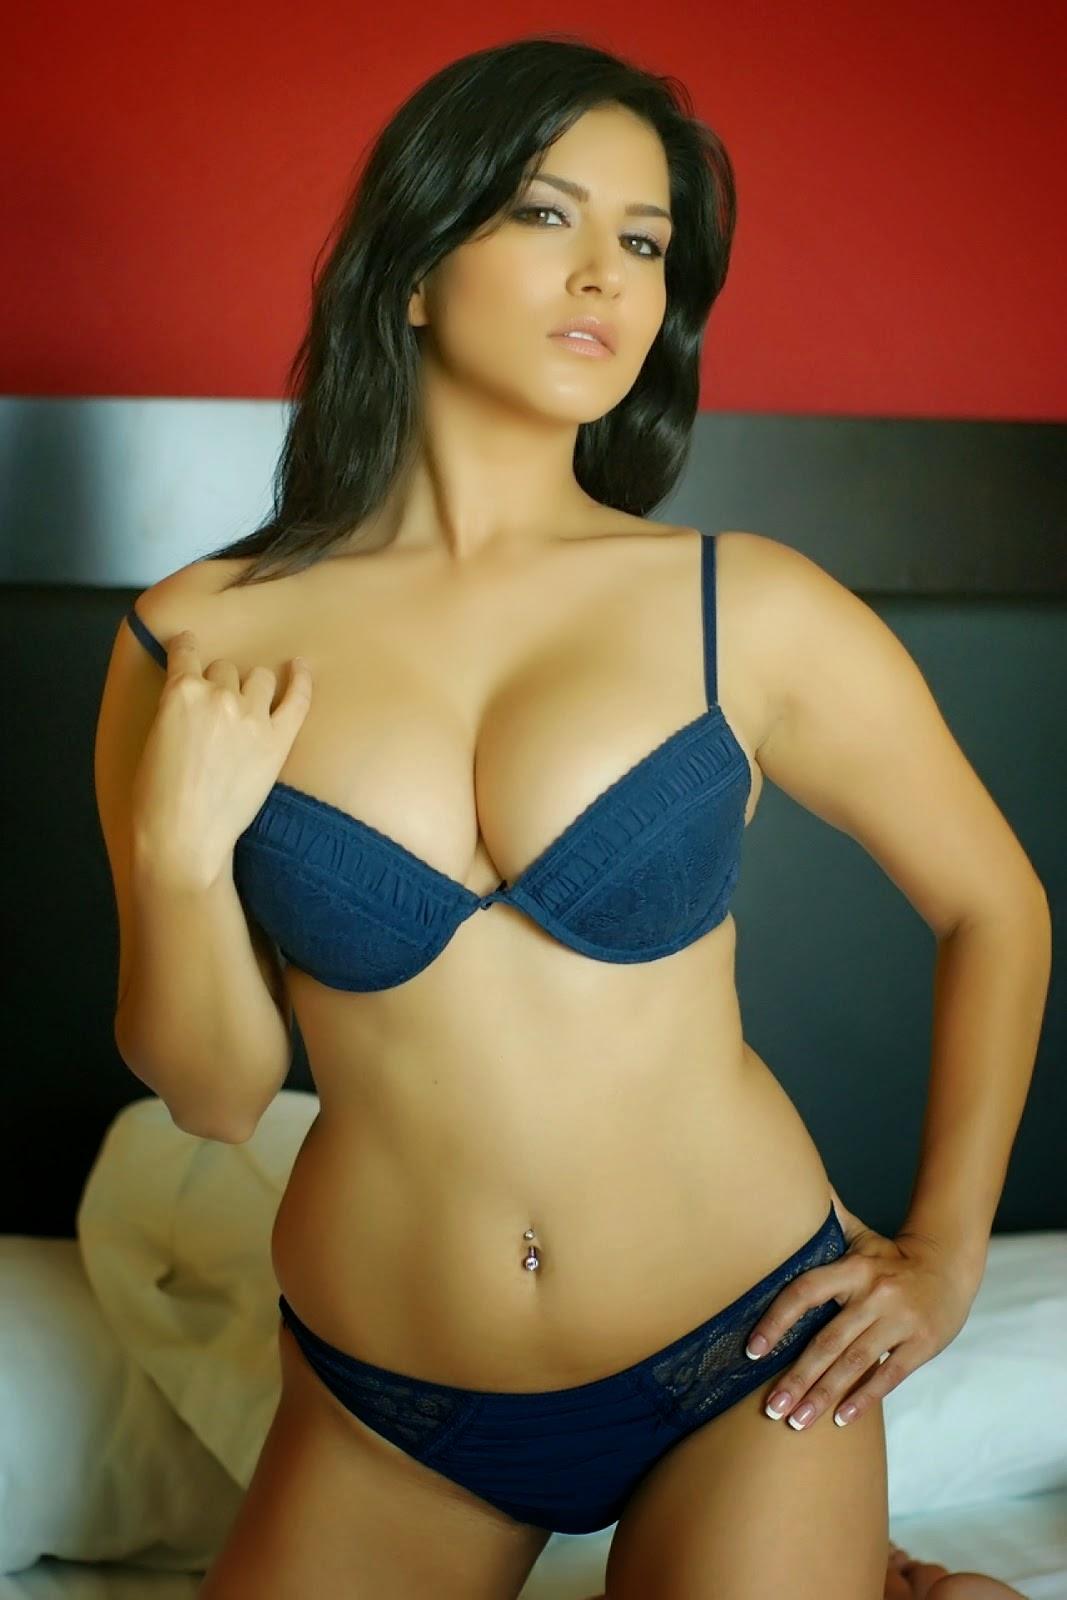 Sunny Leone Hot Images In Blue Bikini - Hot4Sure-7781